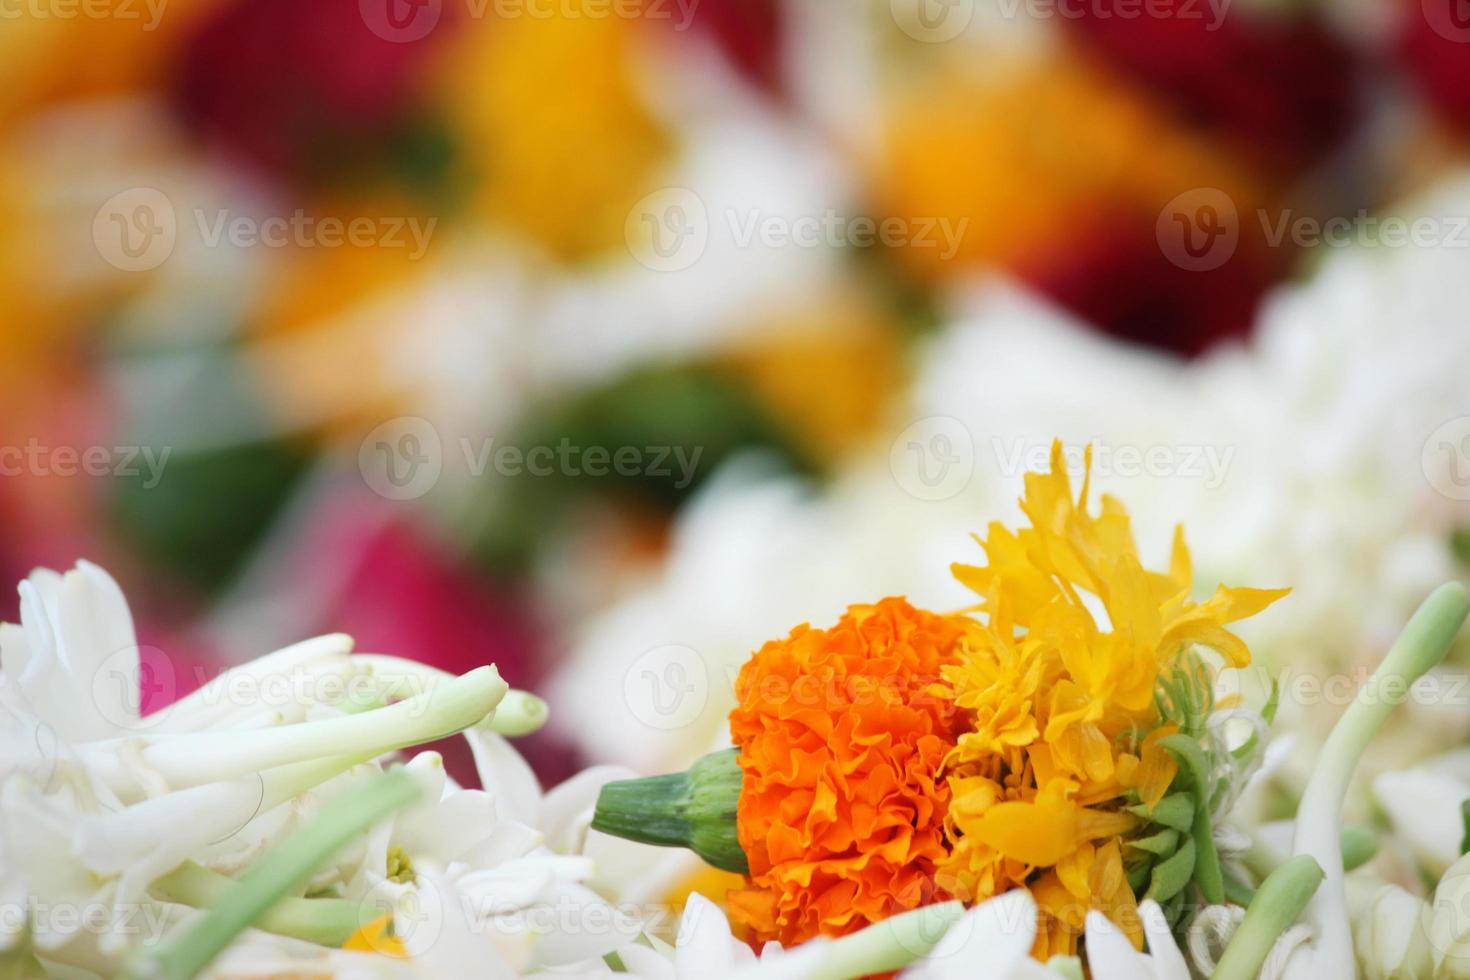 goudsbloem met witte bloemen foto